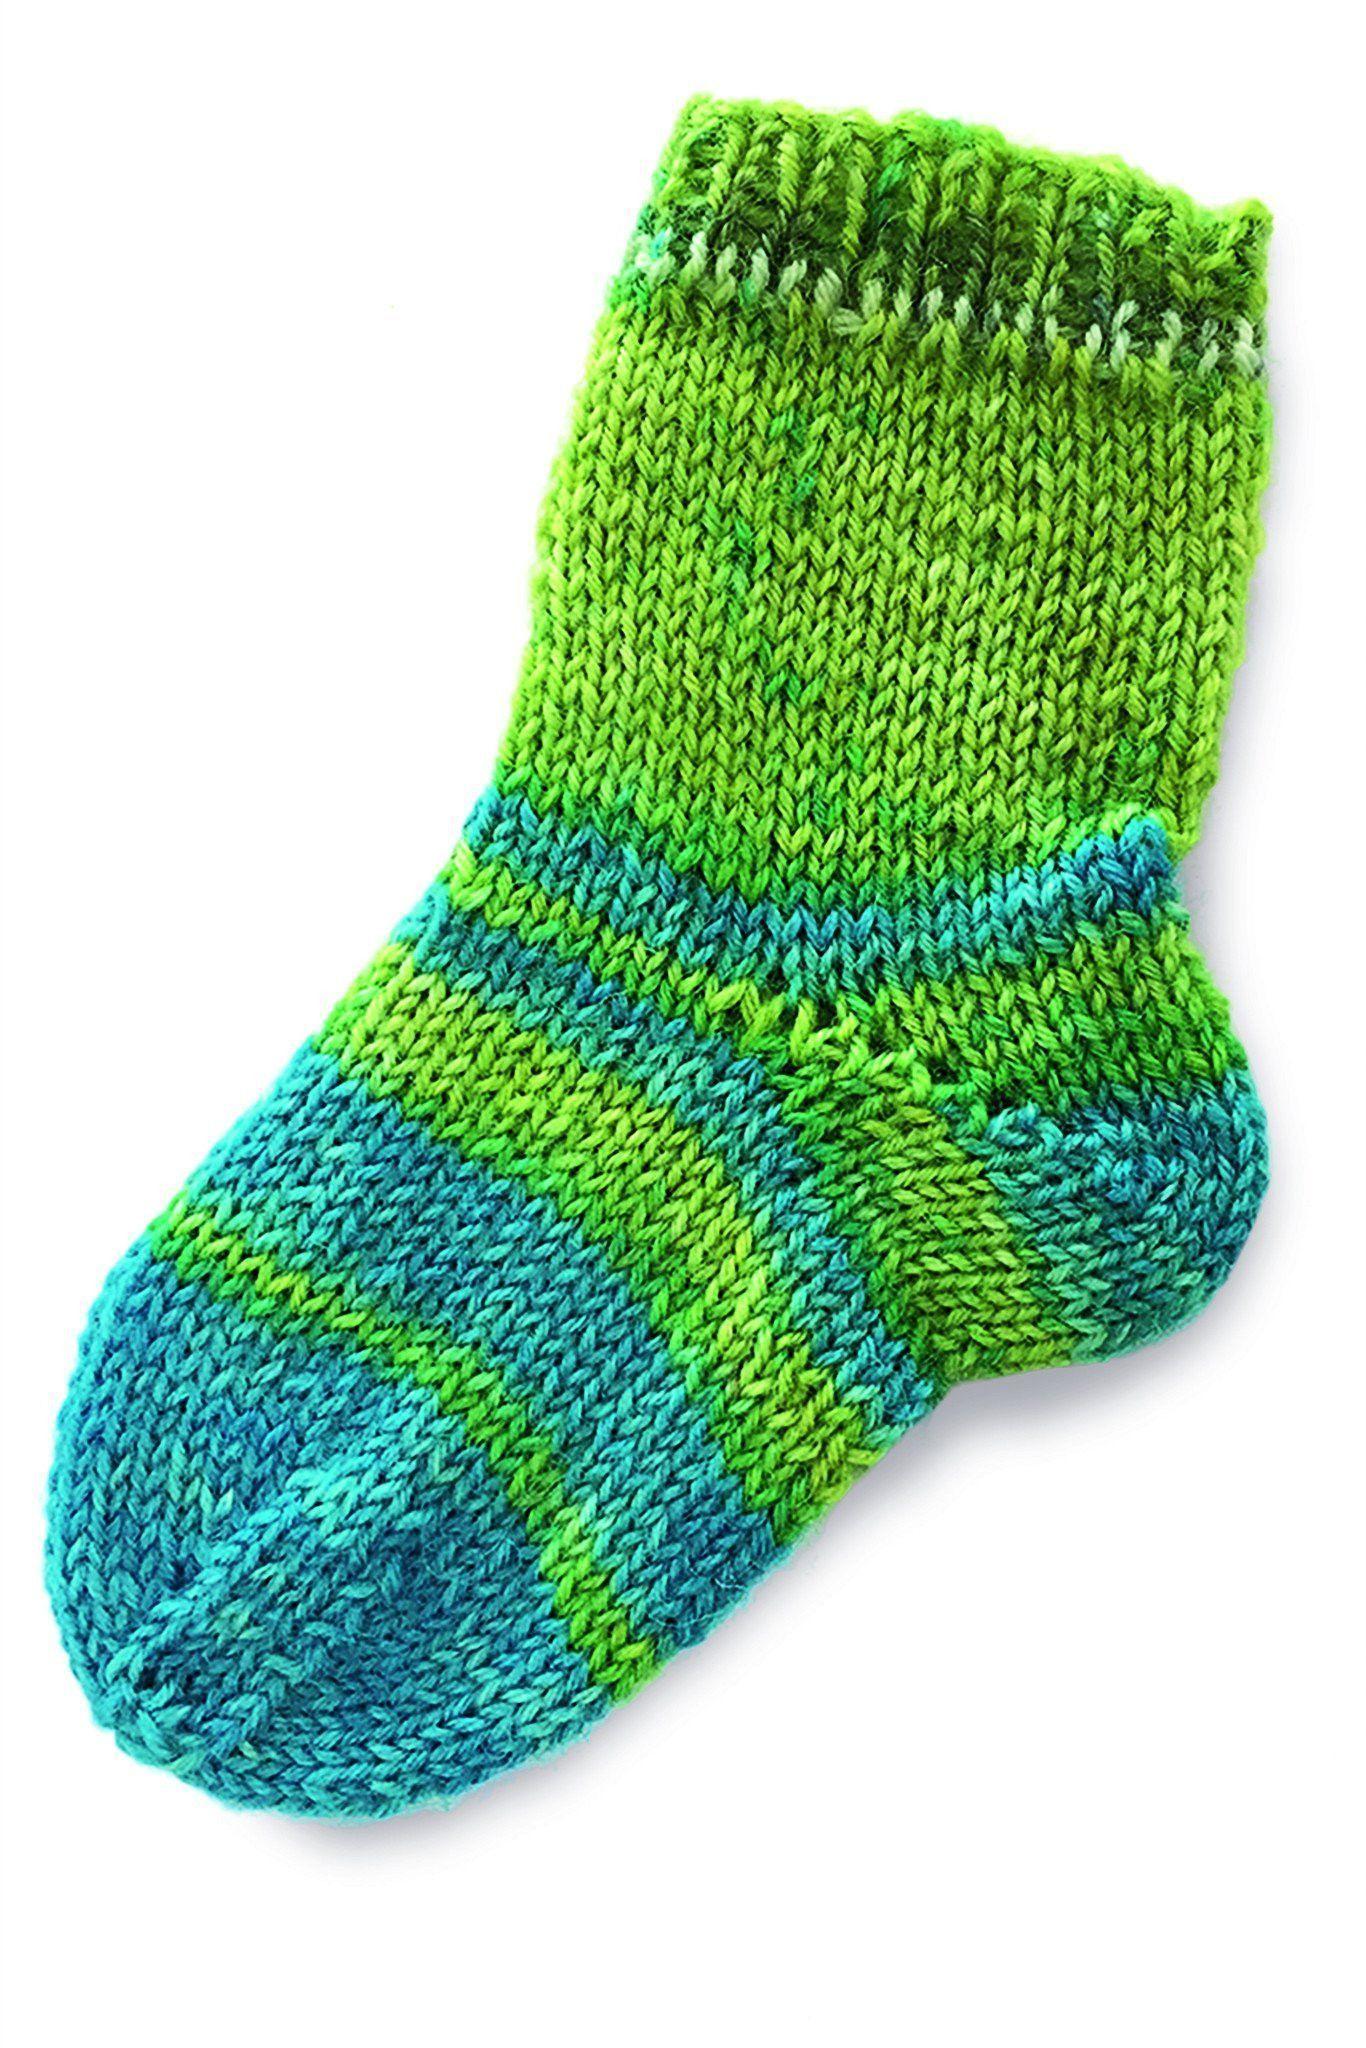 Baby Socks Knitting Pattern   The Knitting Network